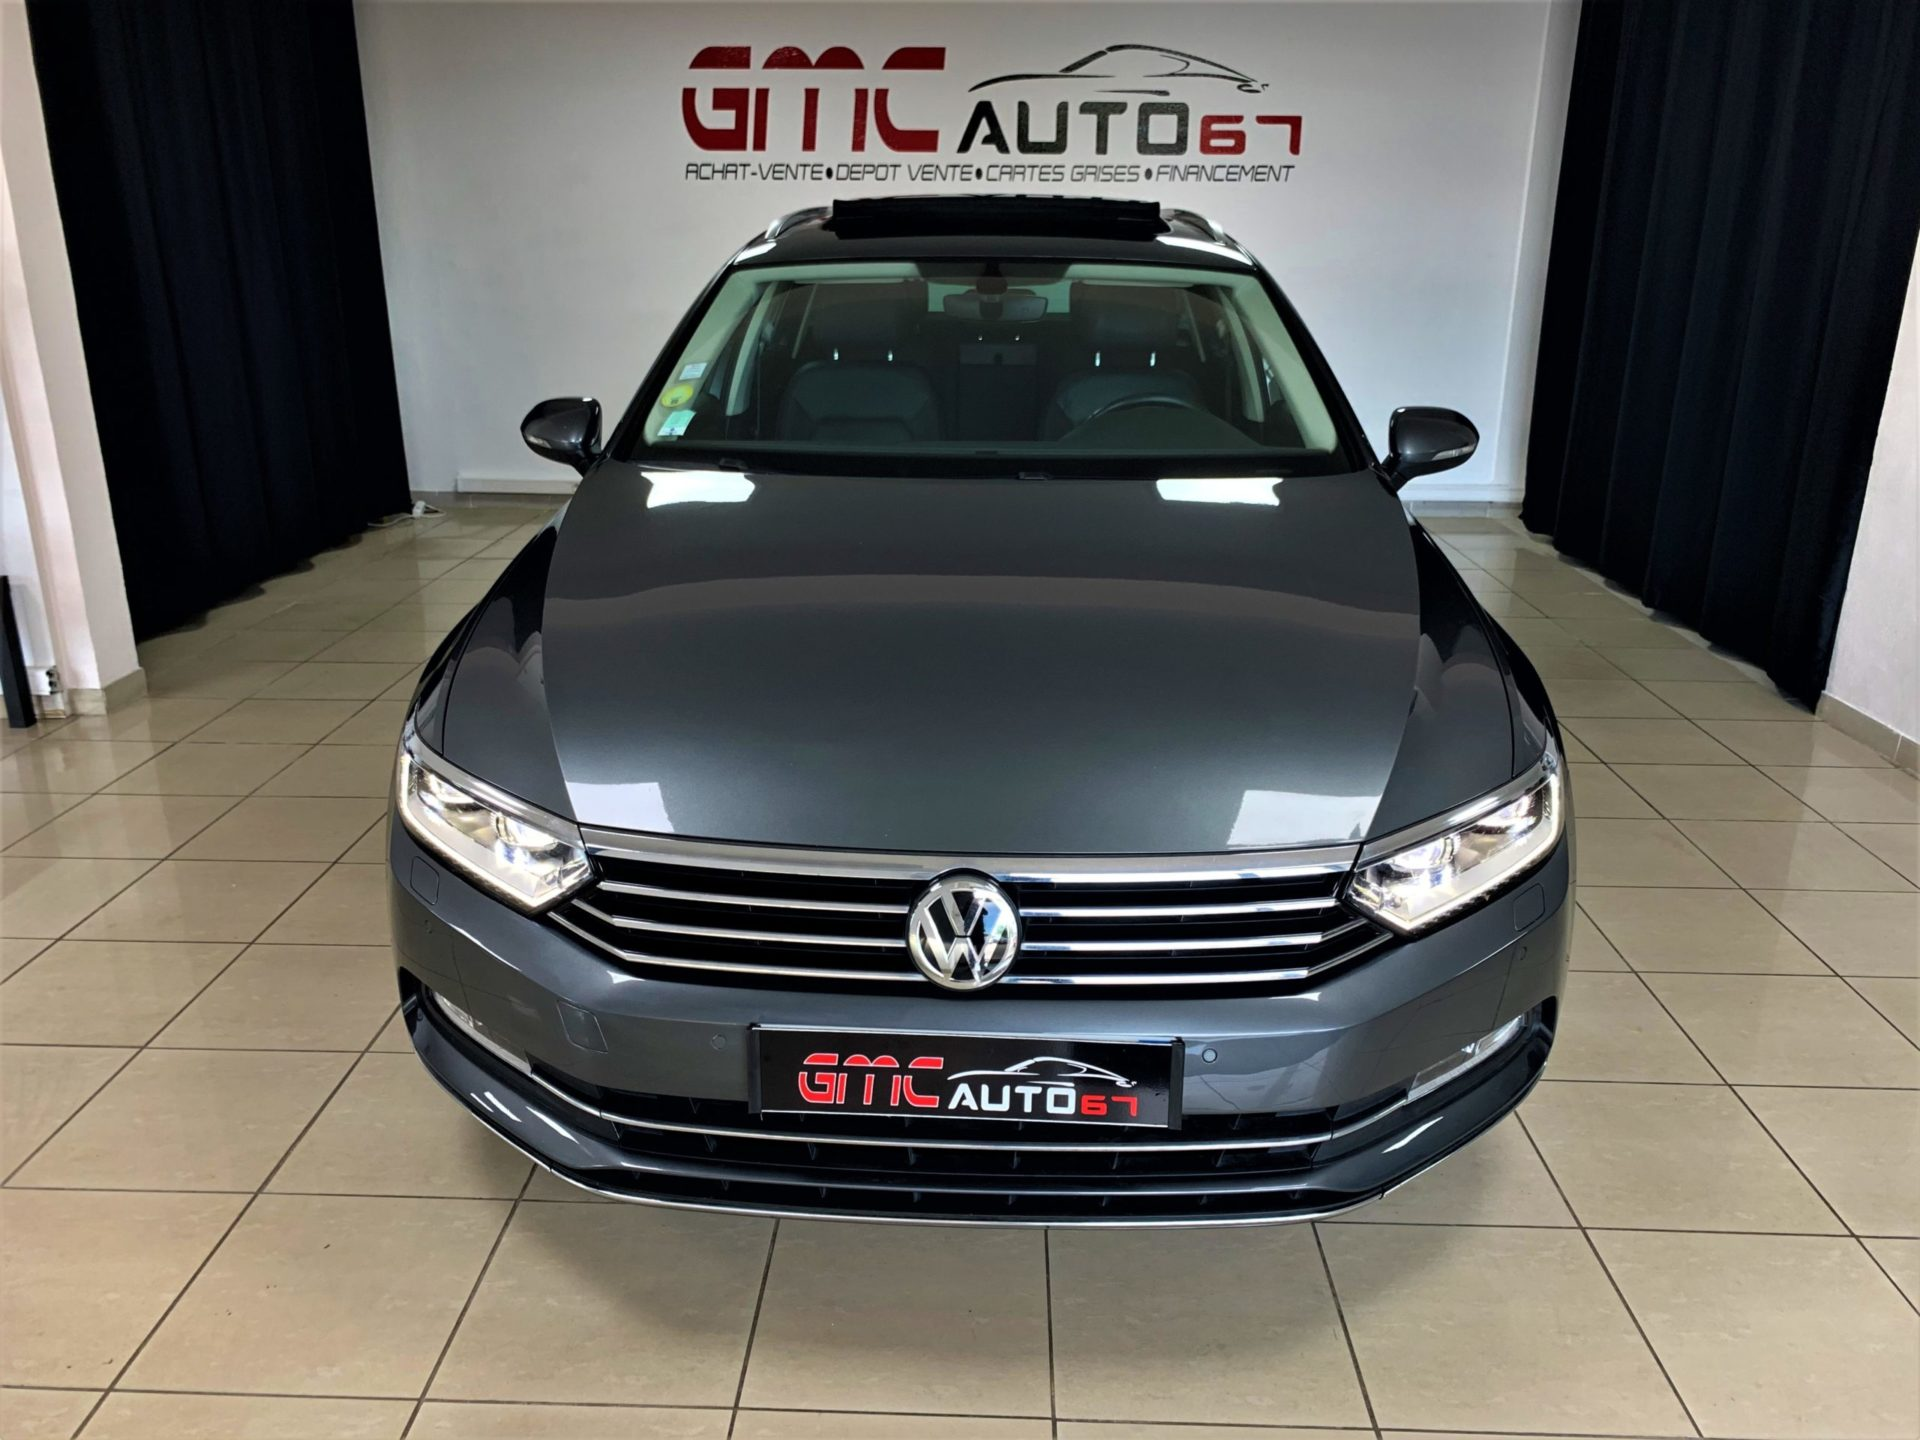 Volkswagen Passat SW 2.0 TDI 150 BlueMotion Technology Carat Edition break - GMC AUTO 67